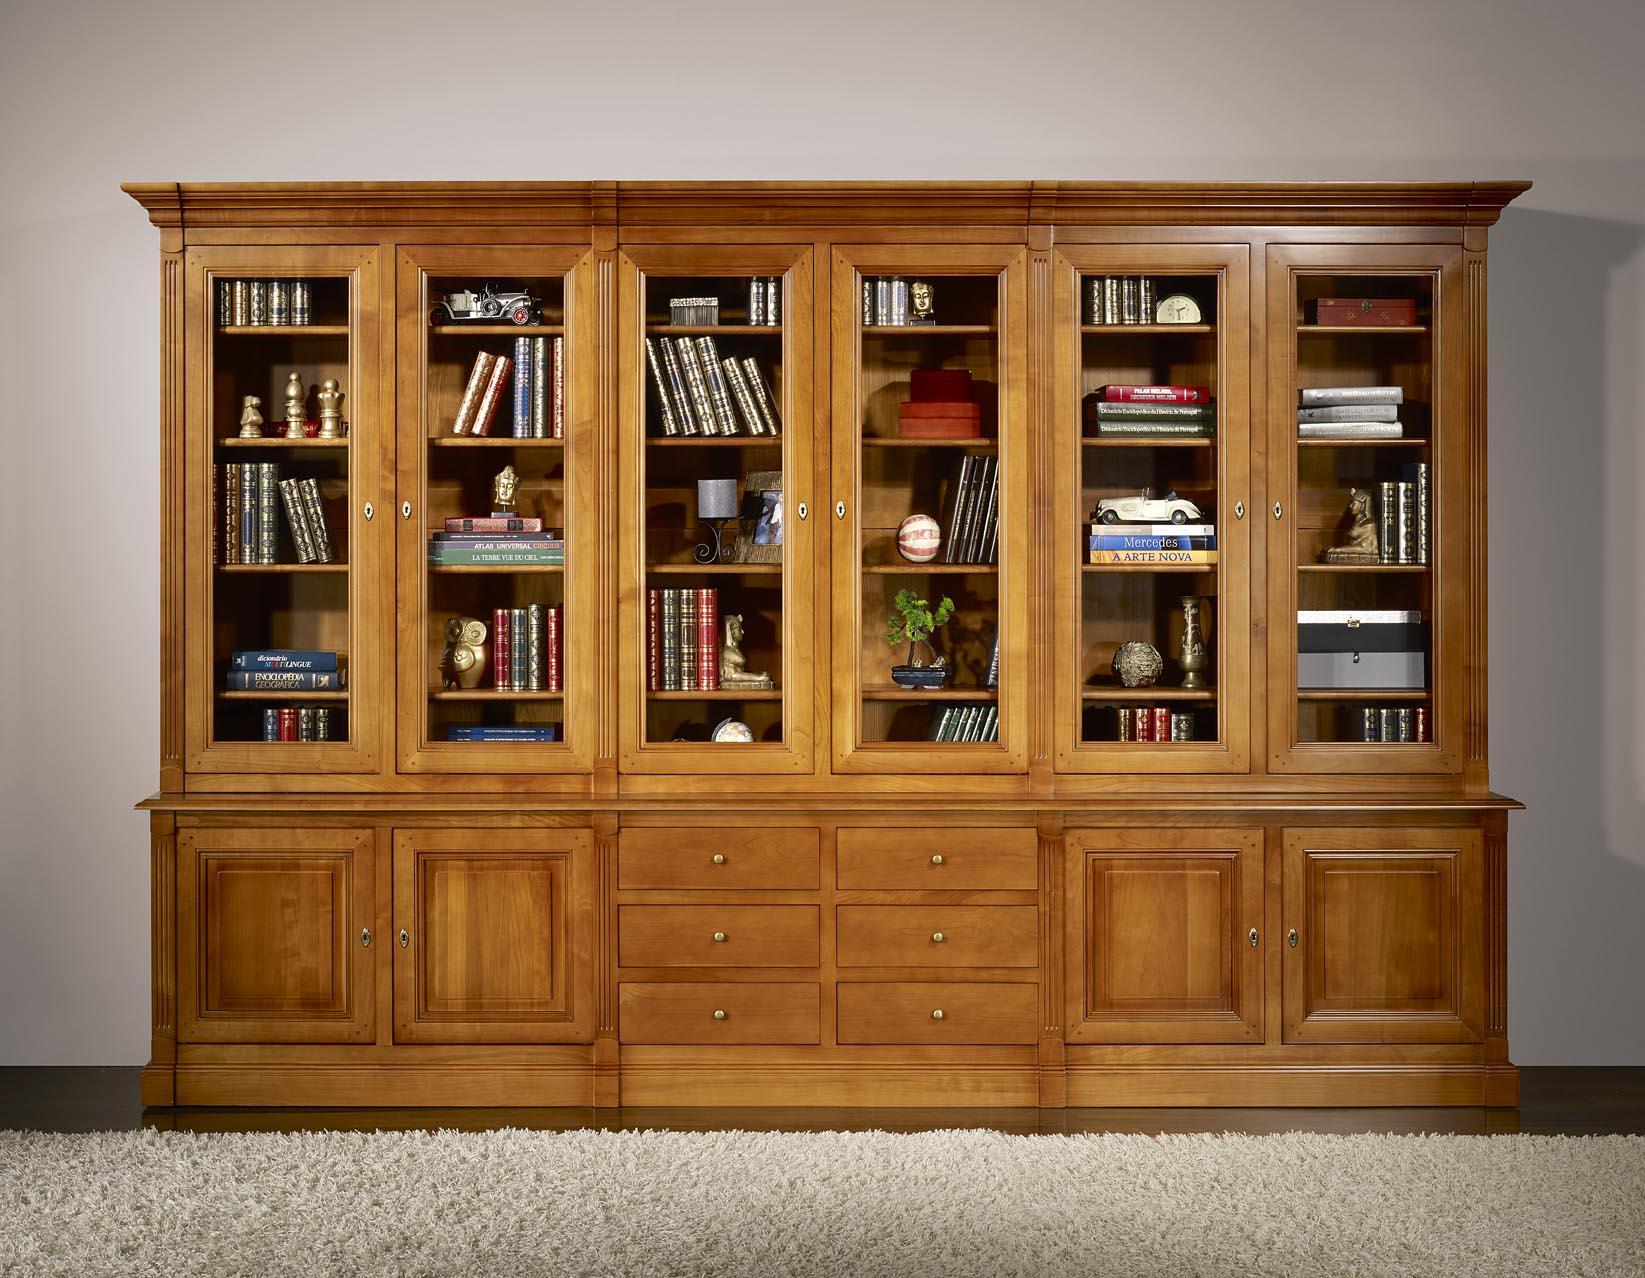 Biblioth que 2 corps 6 portes sabine en merisier massif de style directoire meuble en merisier - Bibliotheque en bois ...